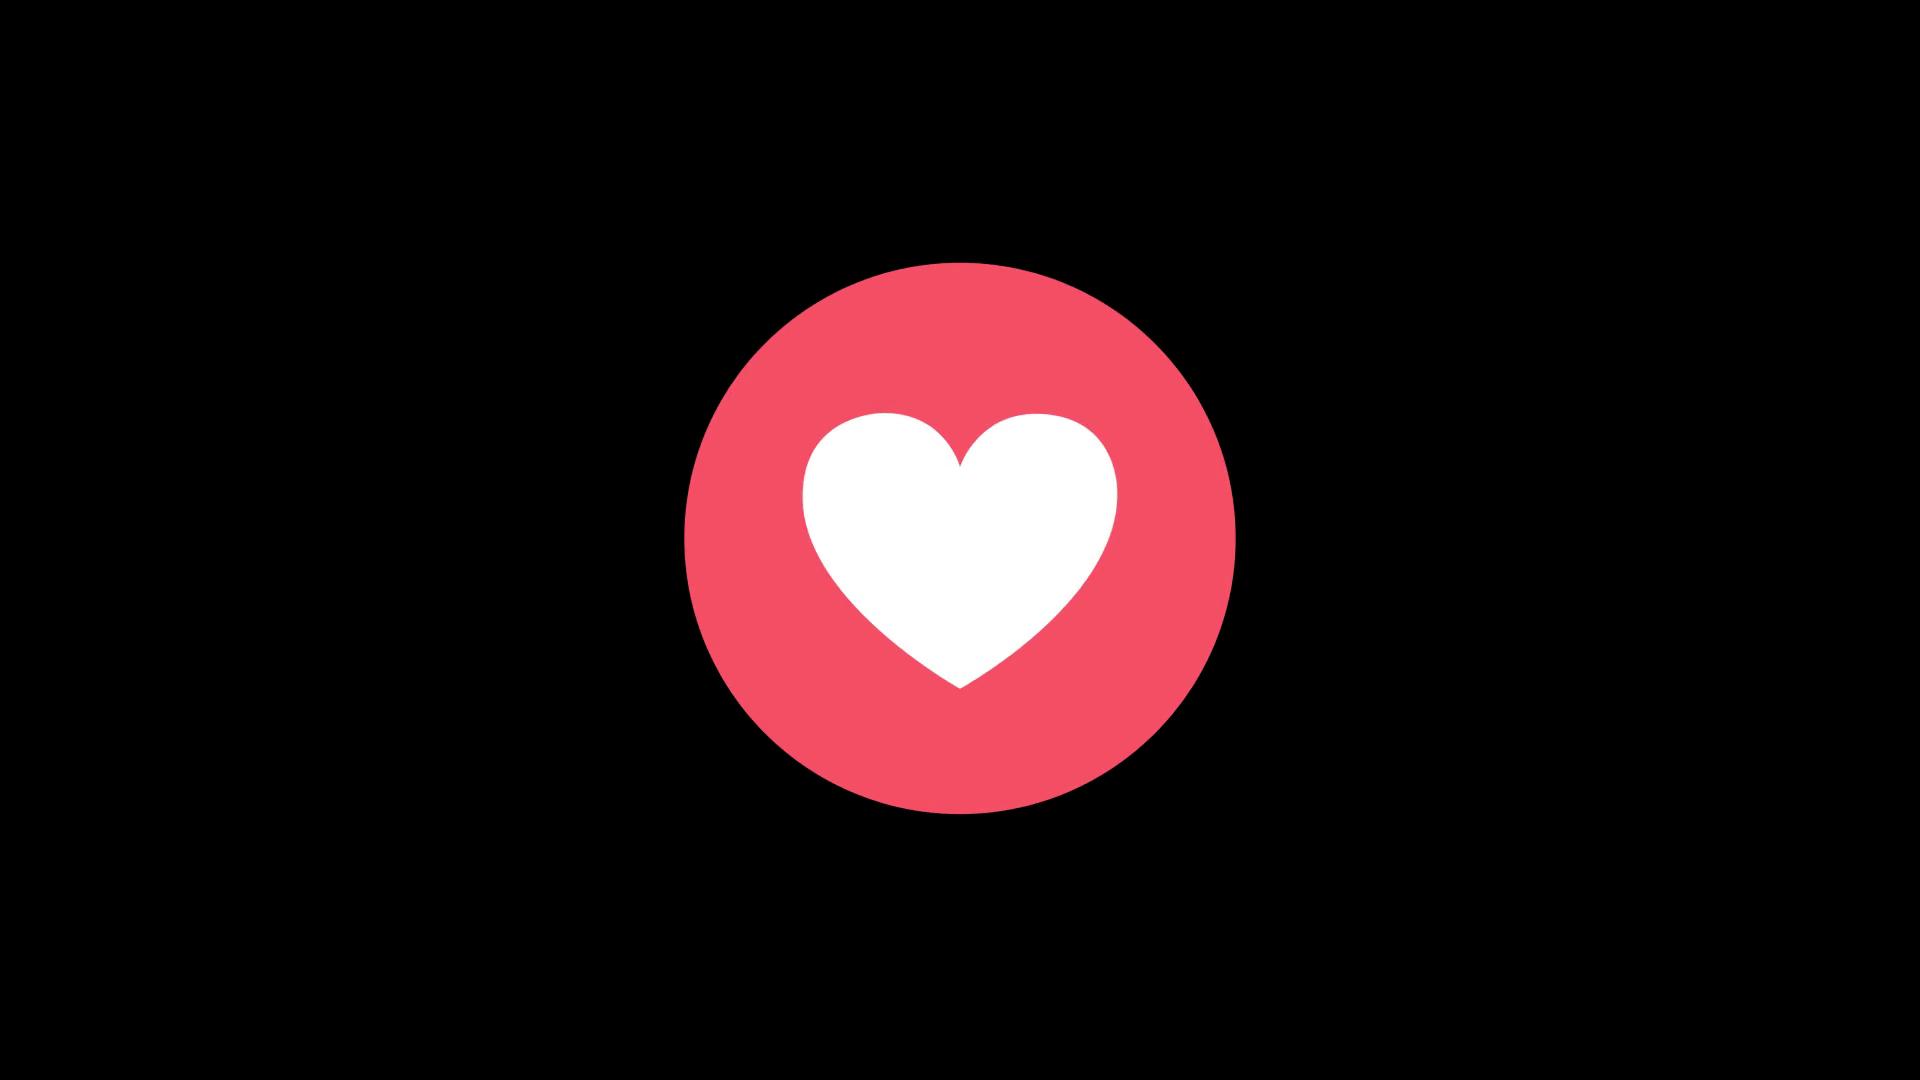 Facebook Reaction Love 1080p Motion Background.